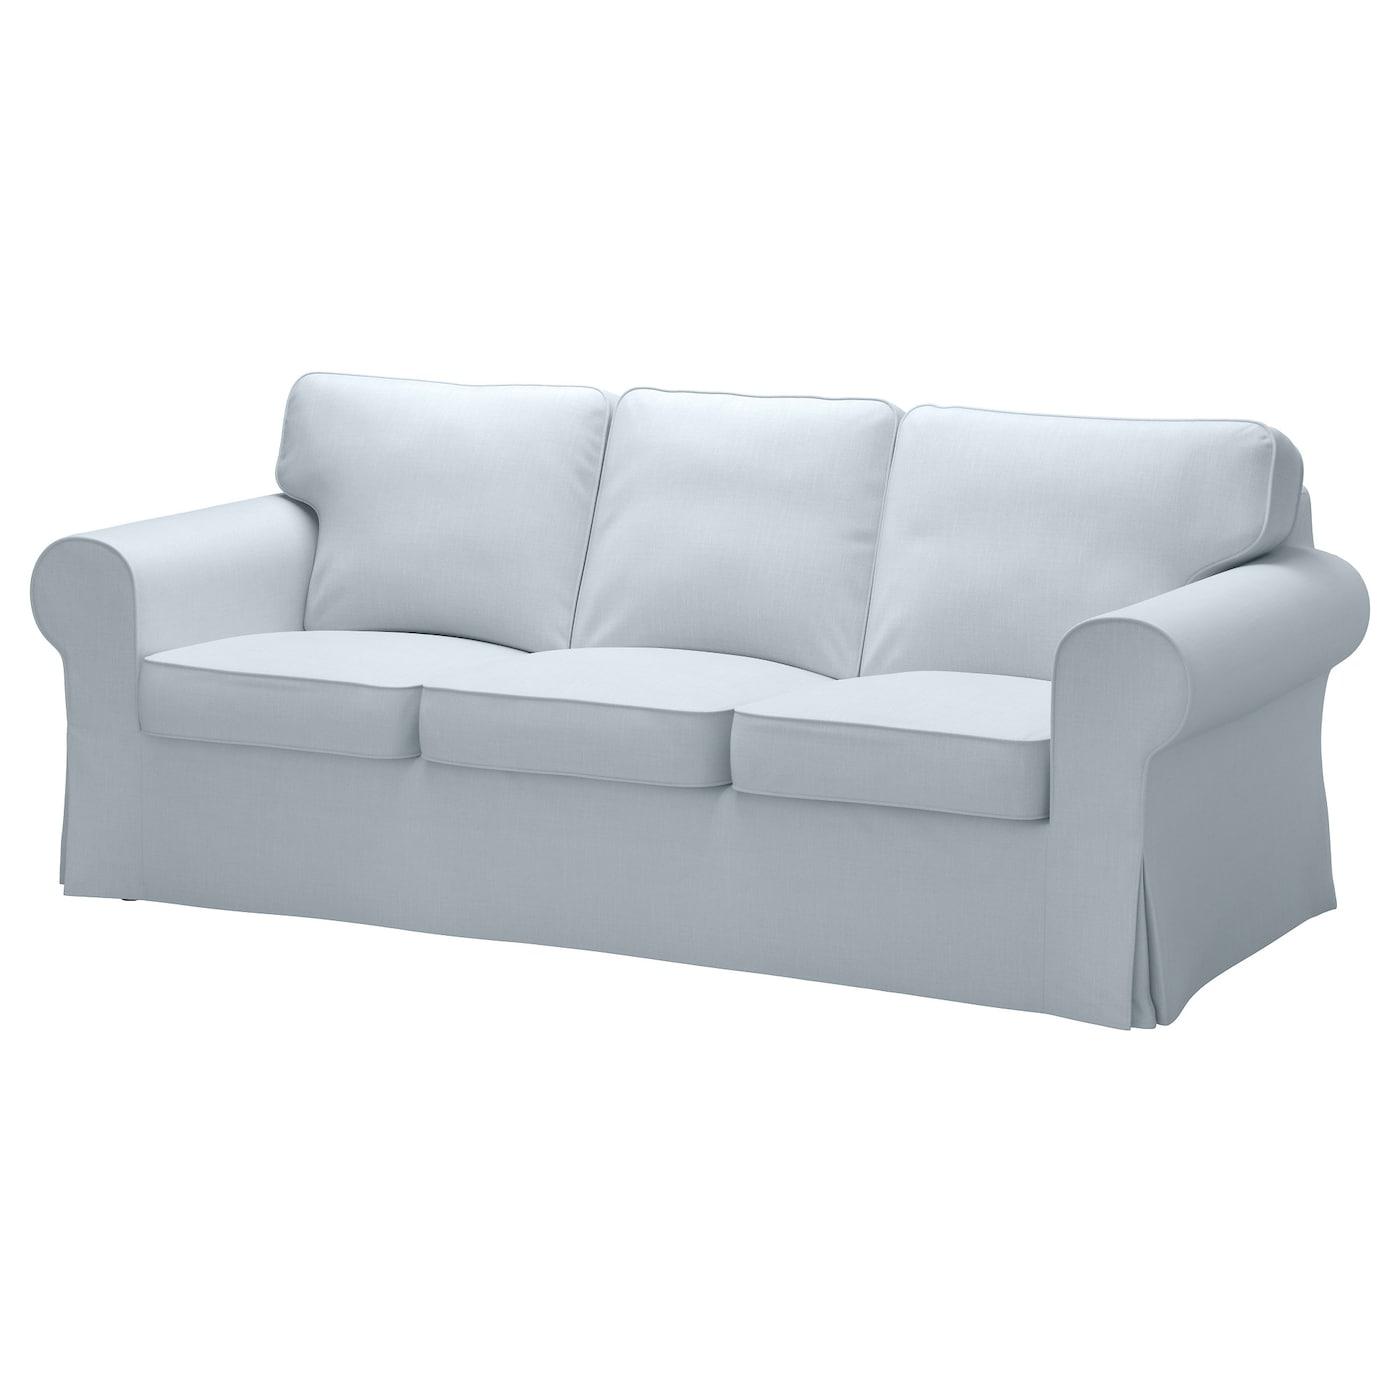 EKTORP Cover three seat sofa Nordvalla light blue IKEA